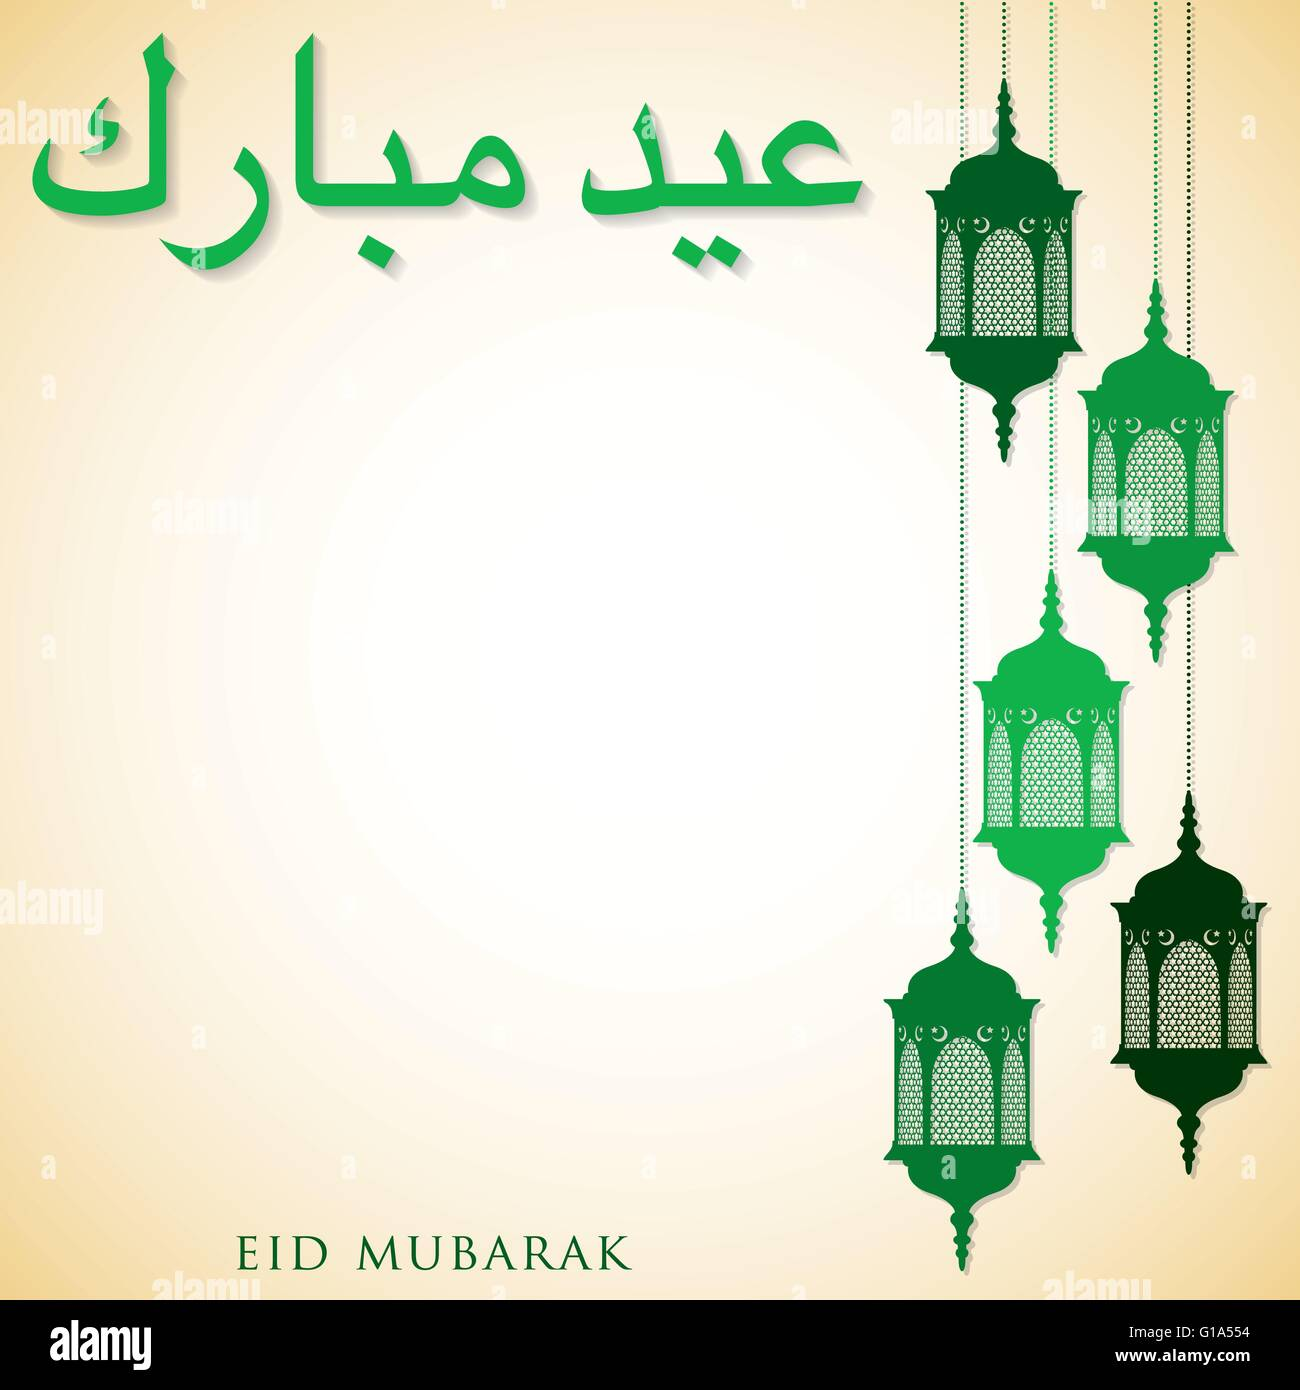 Lantern eid mubarak blessed eid card in vector format stock lantern eid mubarak blessed eid card in vector format kristyandbryce Image collections